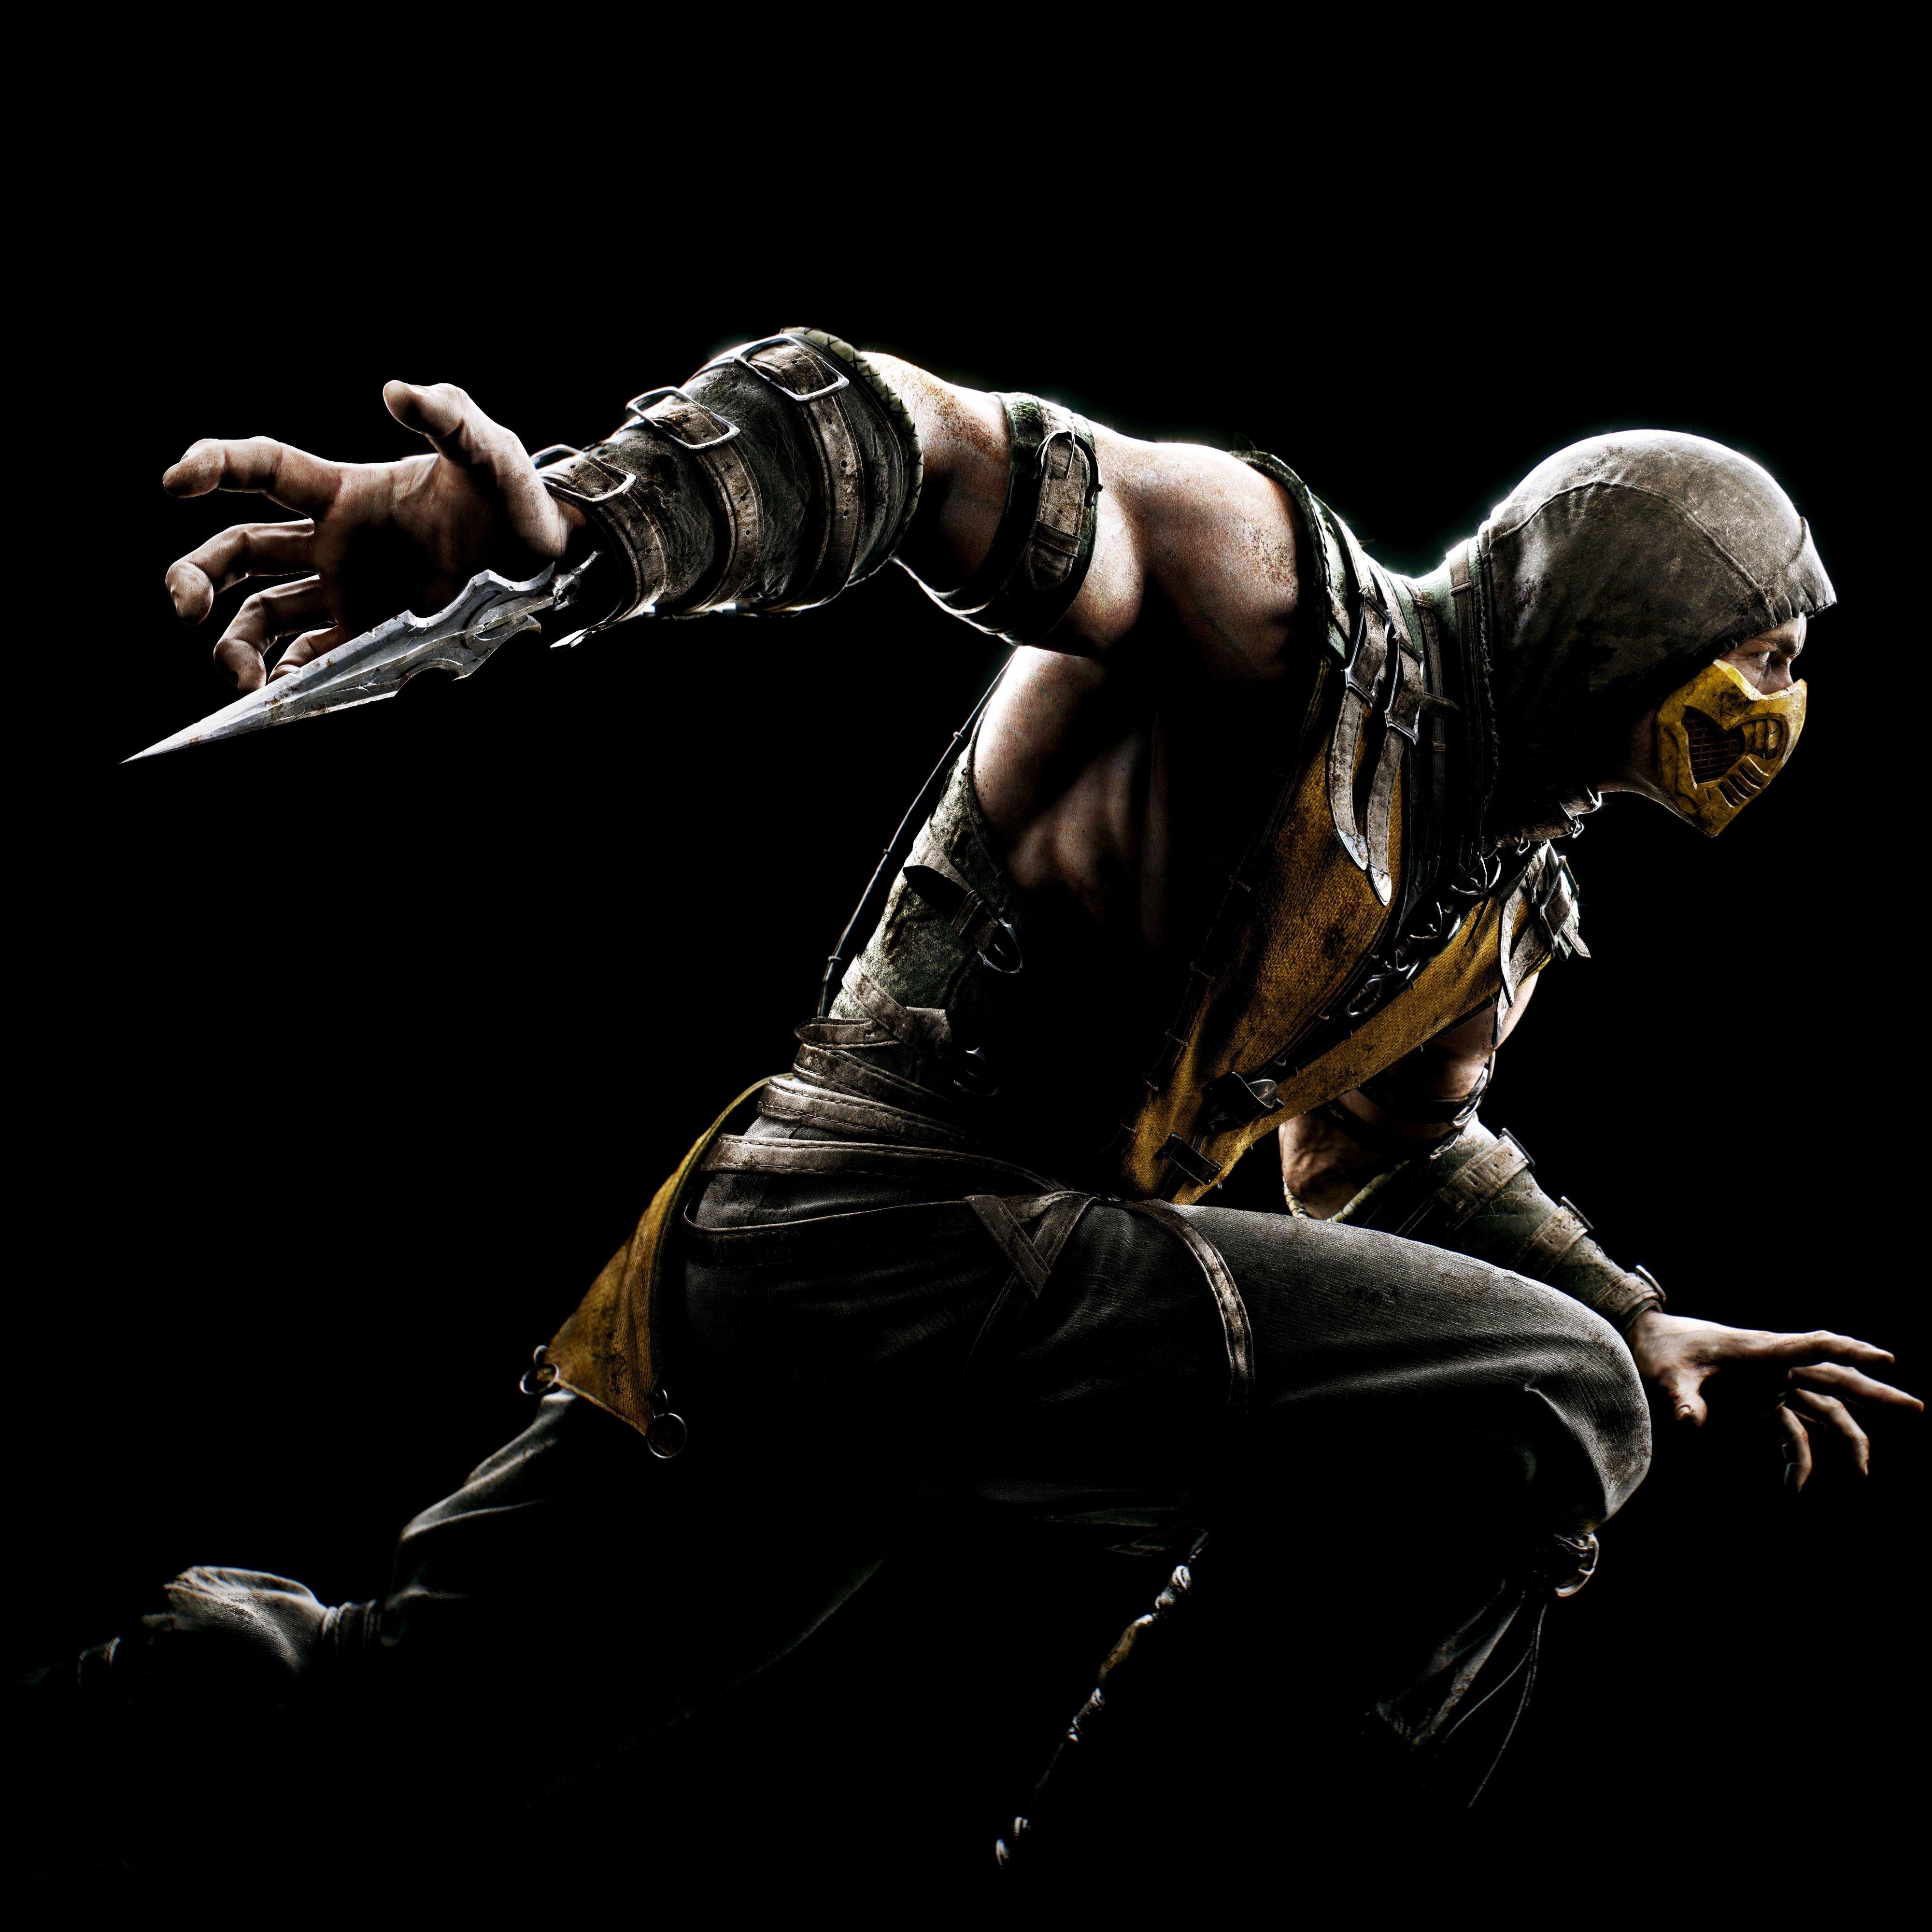 Mortal Kombat X - Изображение 2